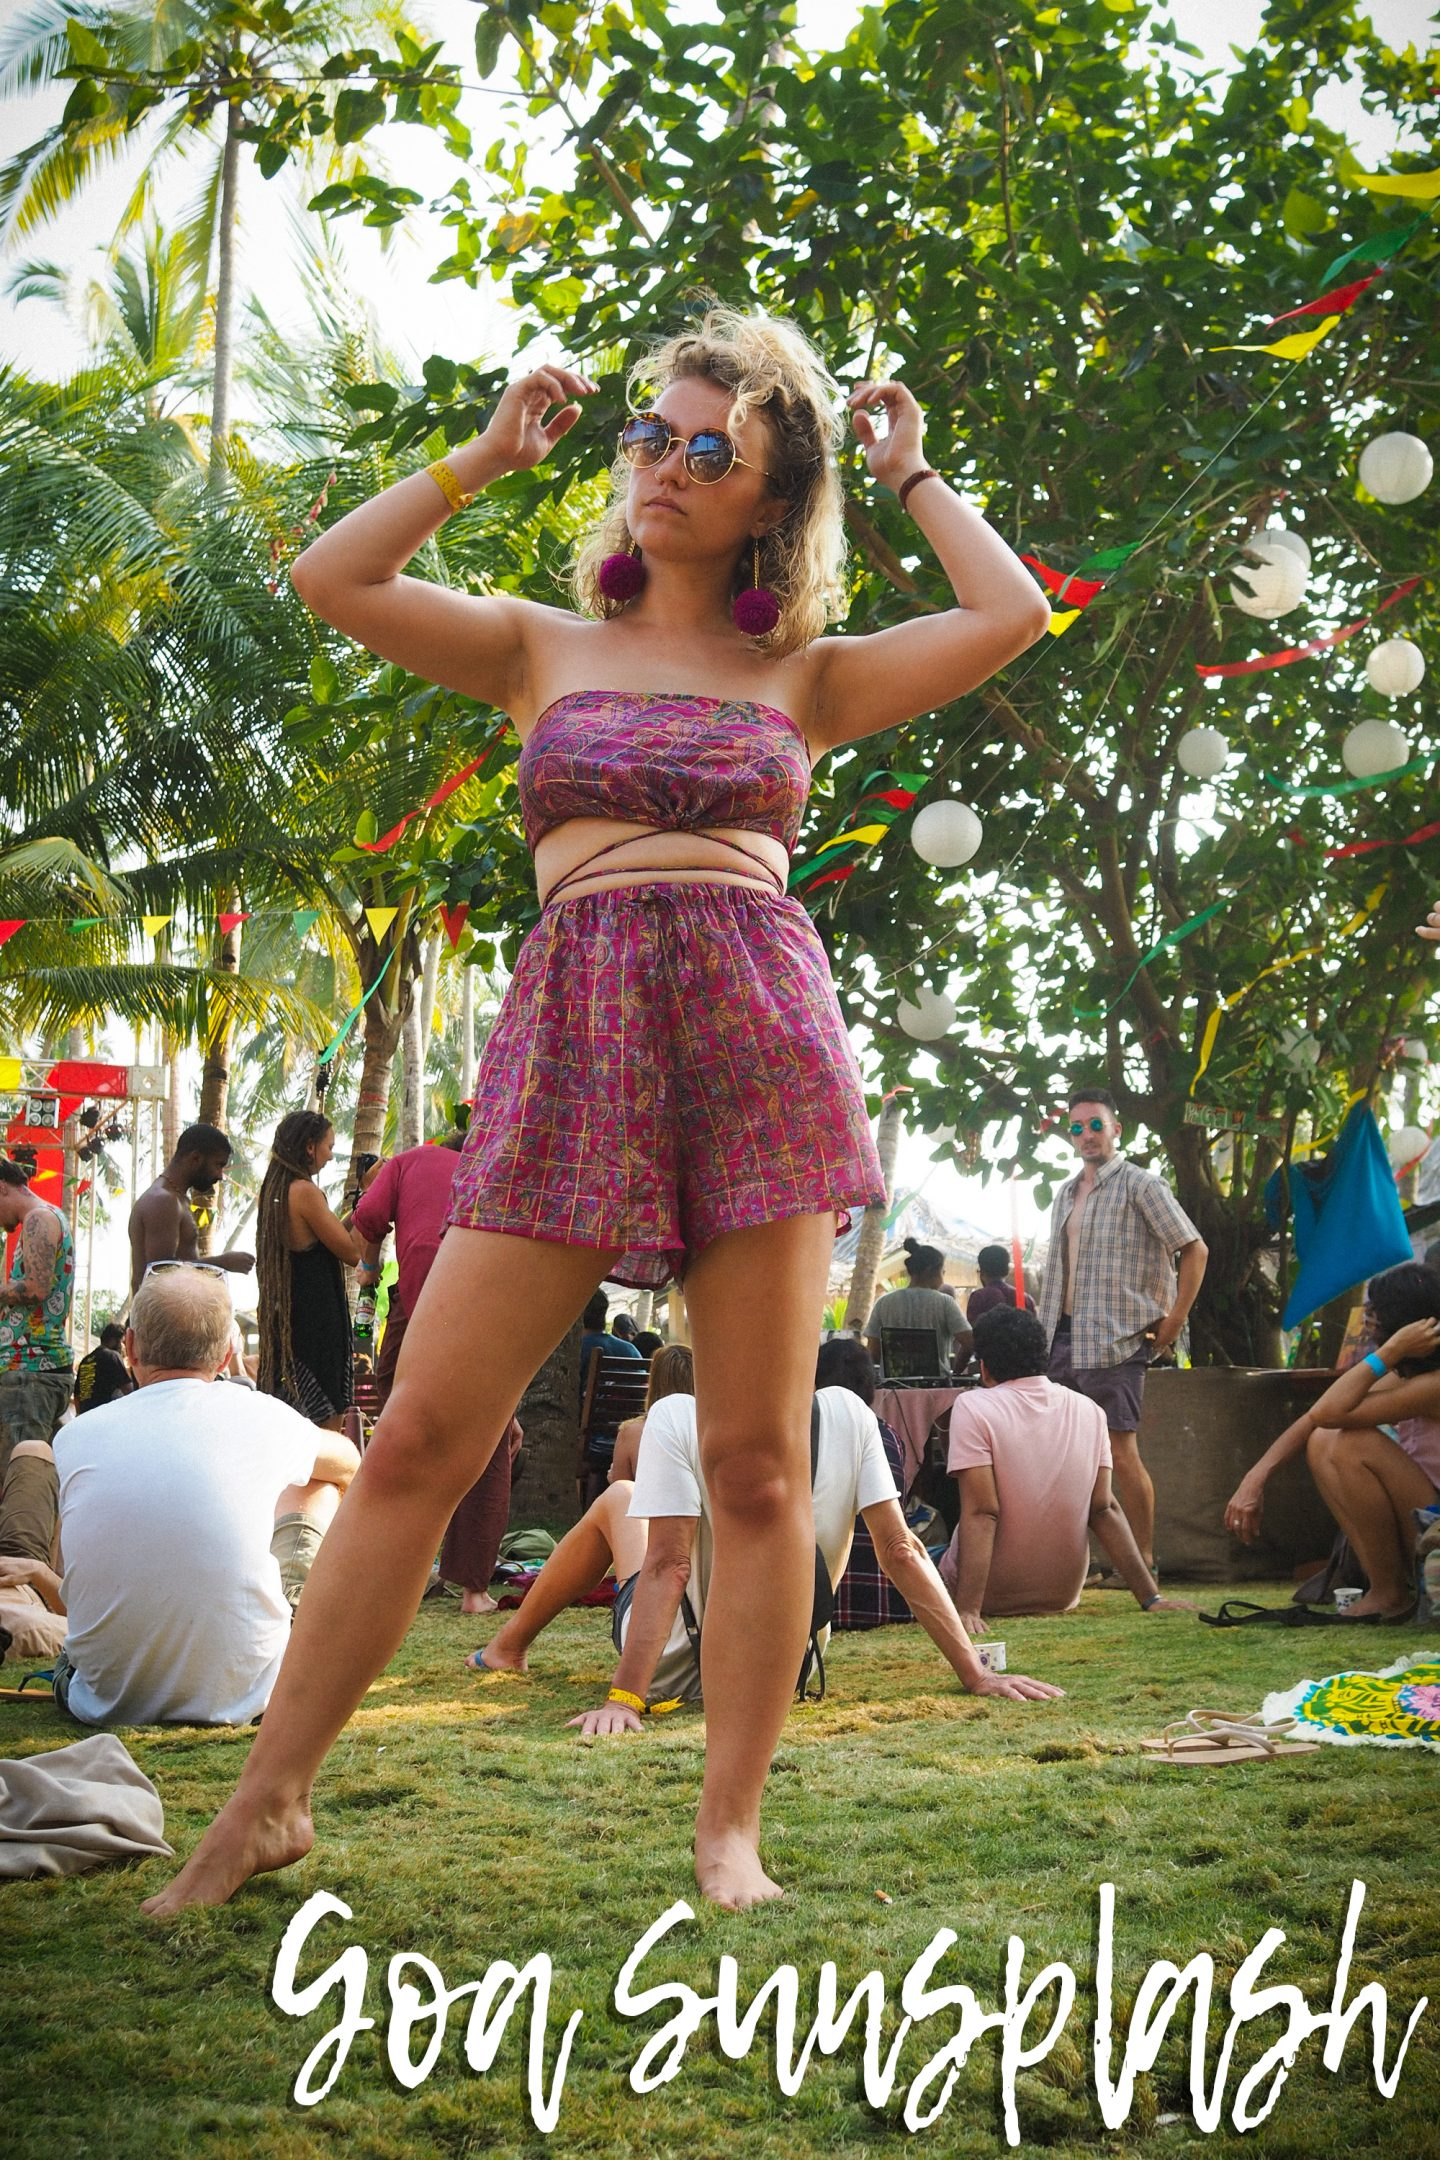 Guide to Goa Sunsplash Reggae festival in India